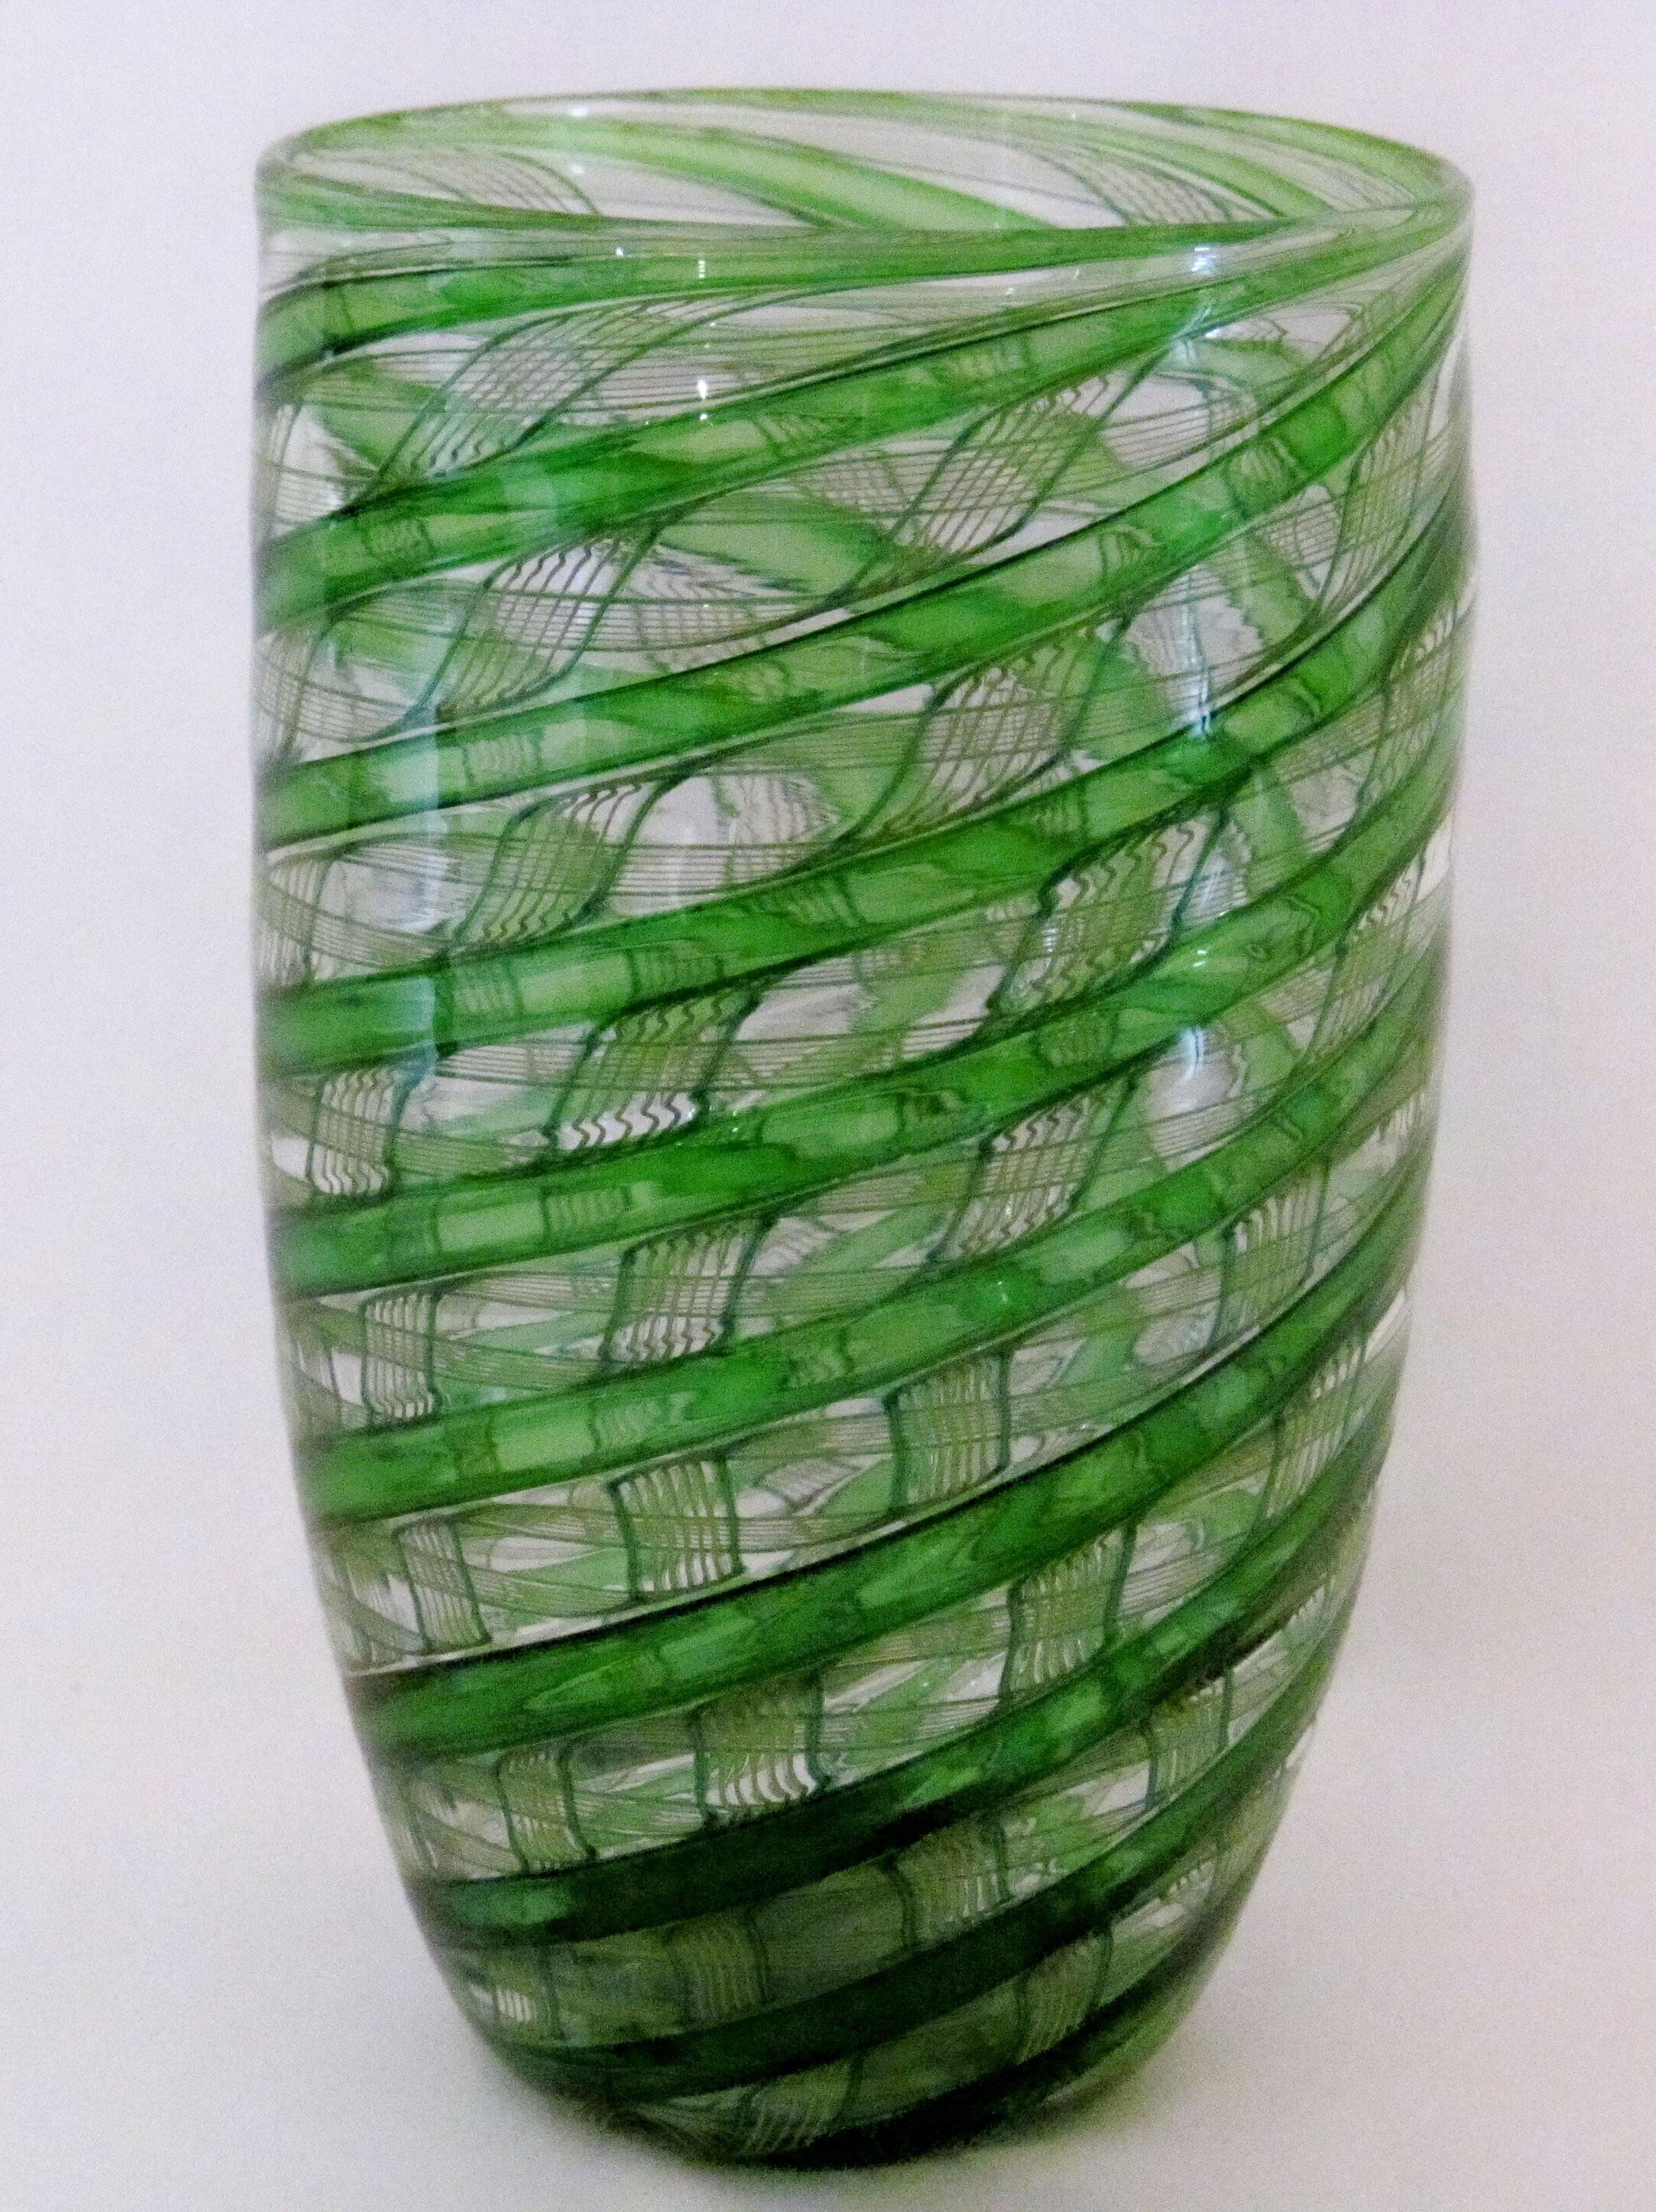 Light Green Cane Glass.jpg